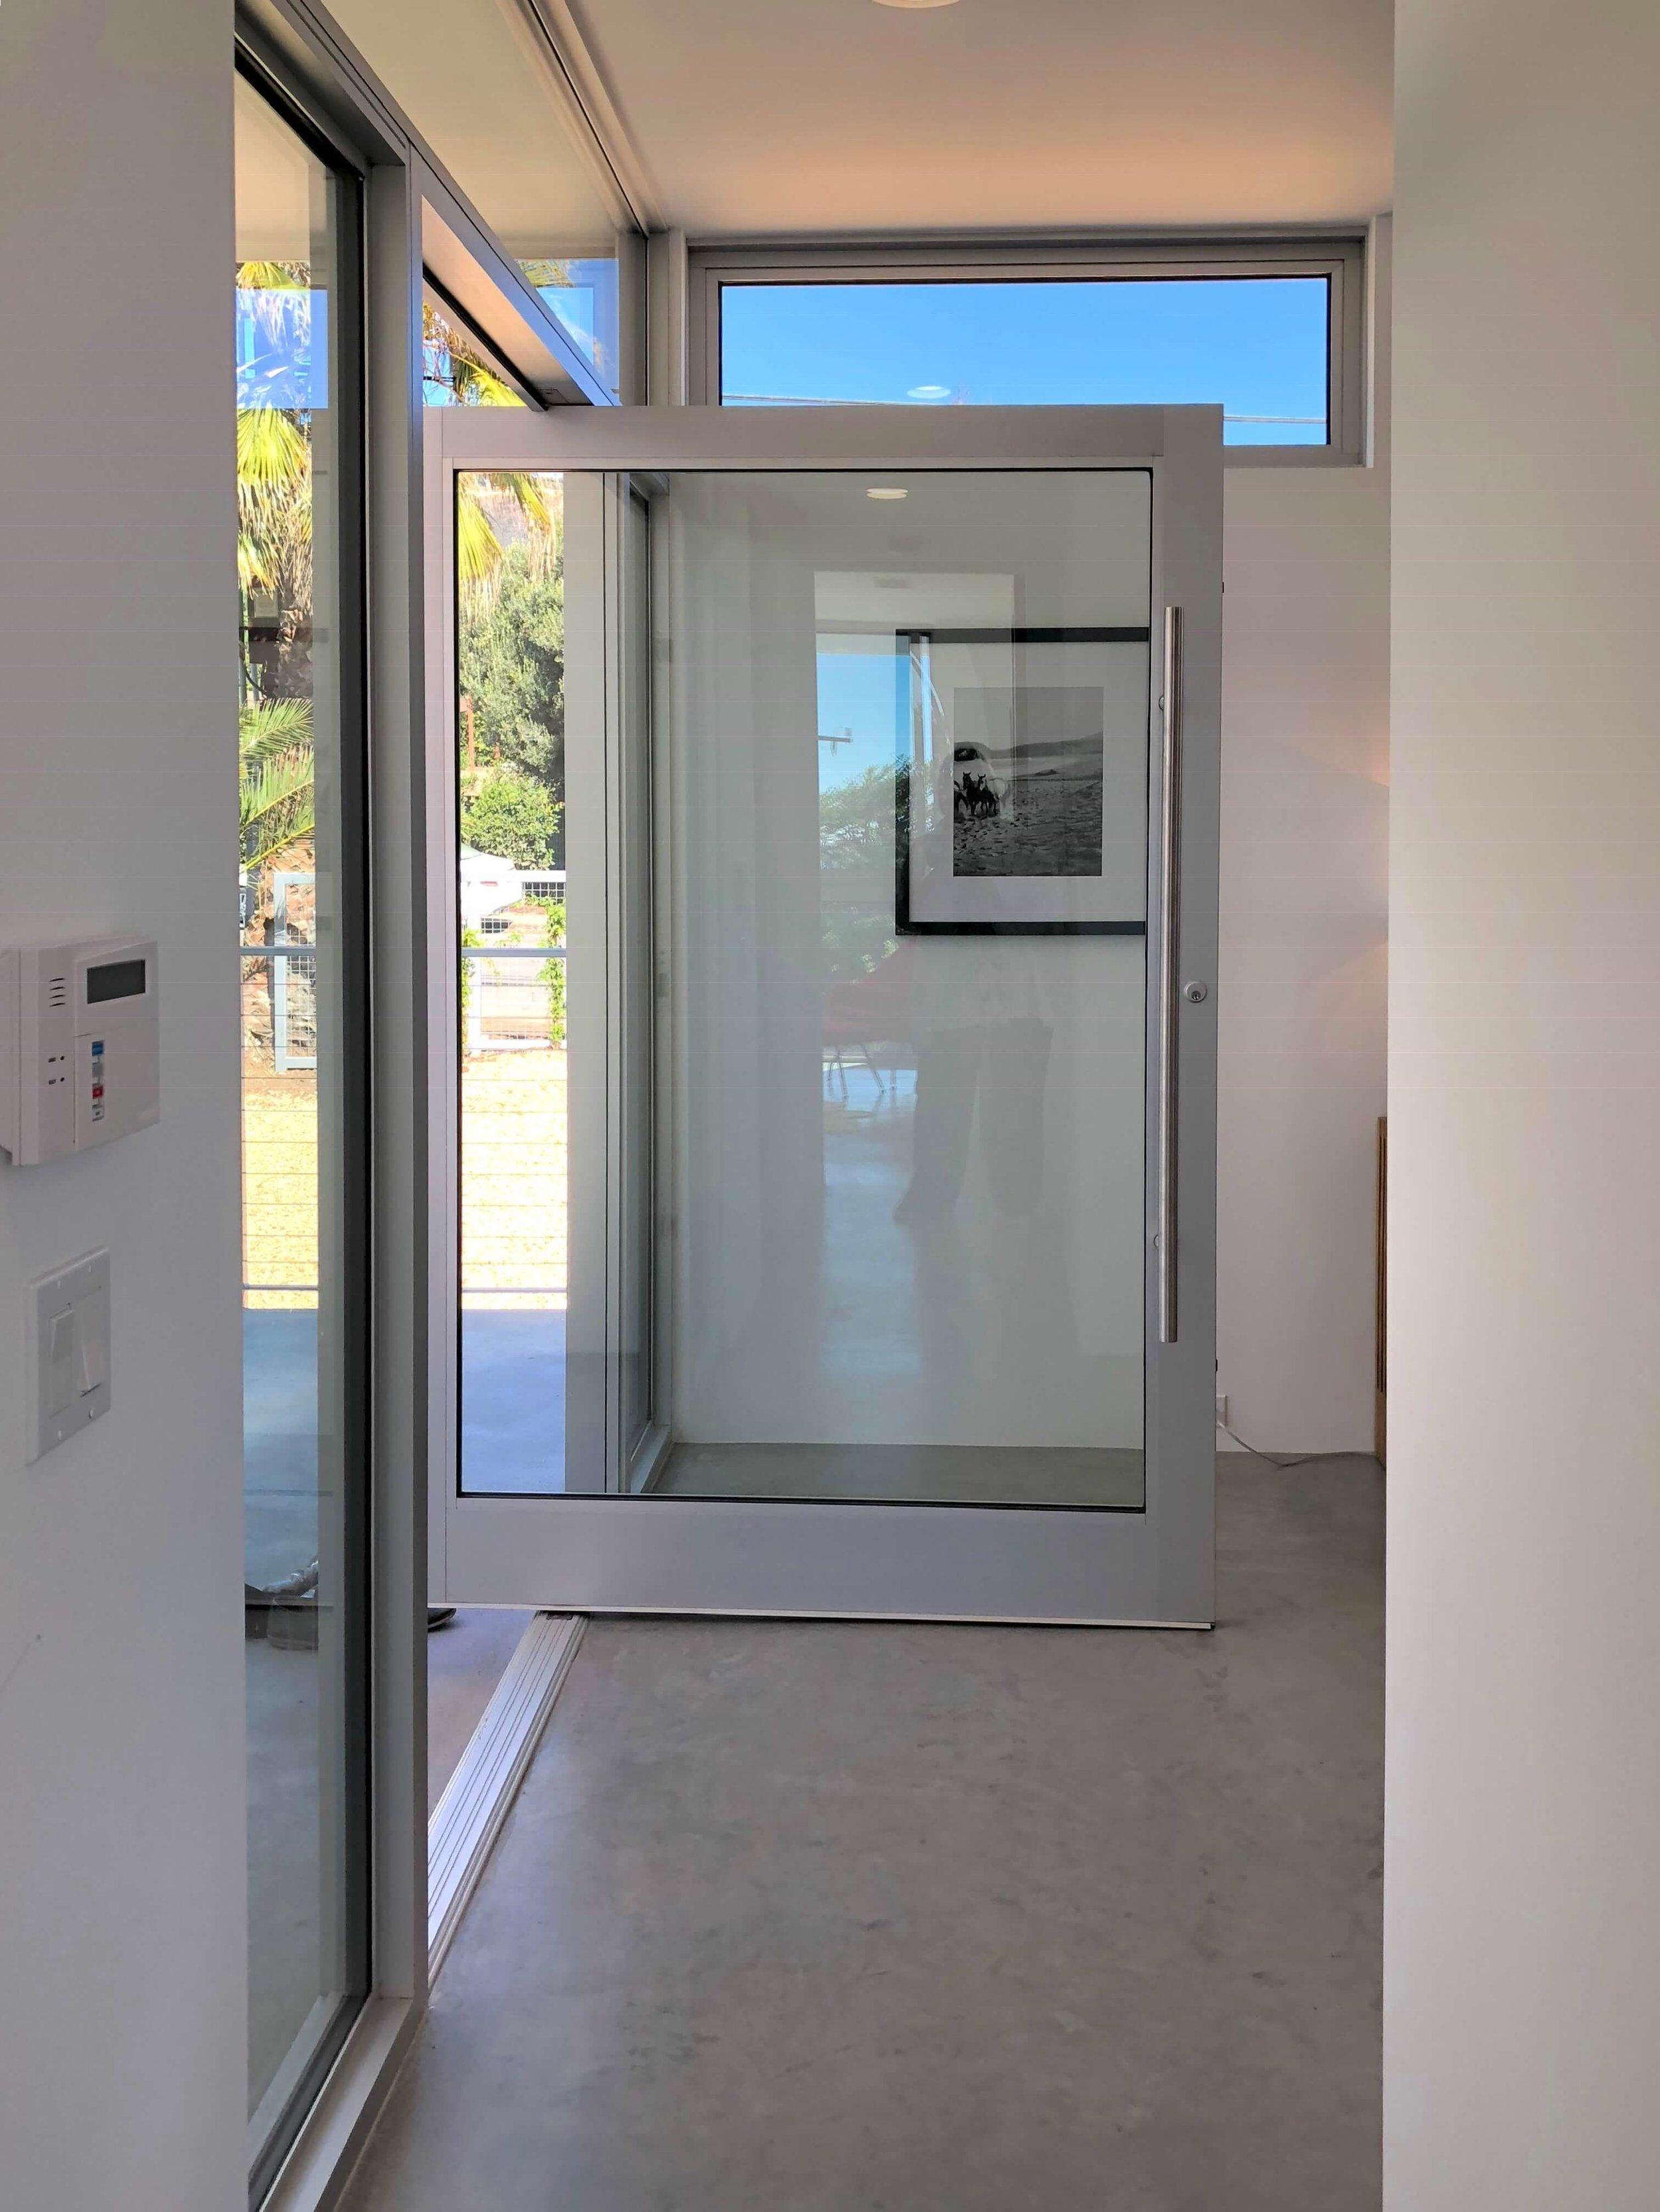 California contemporary design - Dwell on Design's Fall Home Tour, Designer: Vitus Mitare #contemporaryarchitecture #pivotdoor